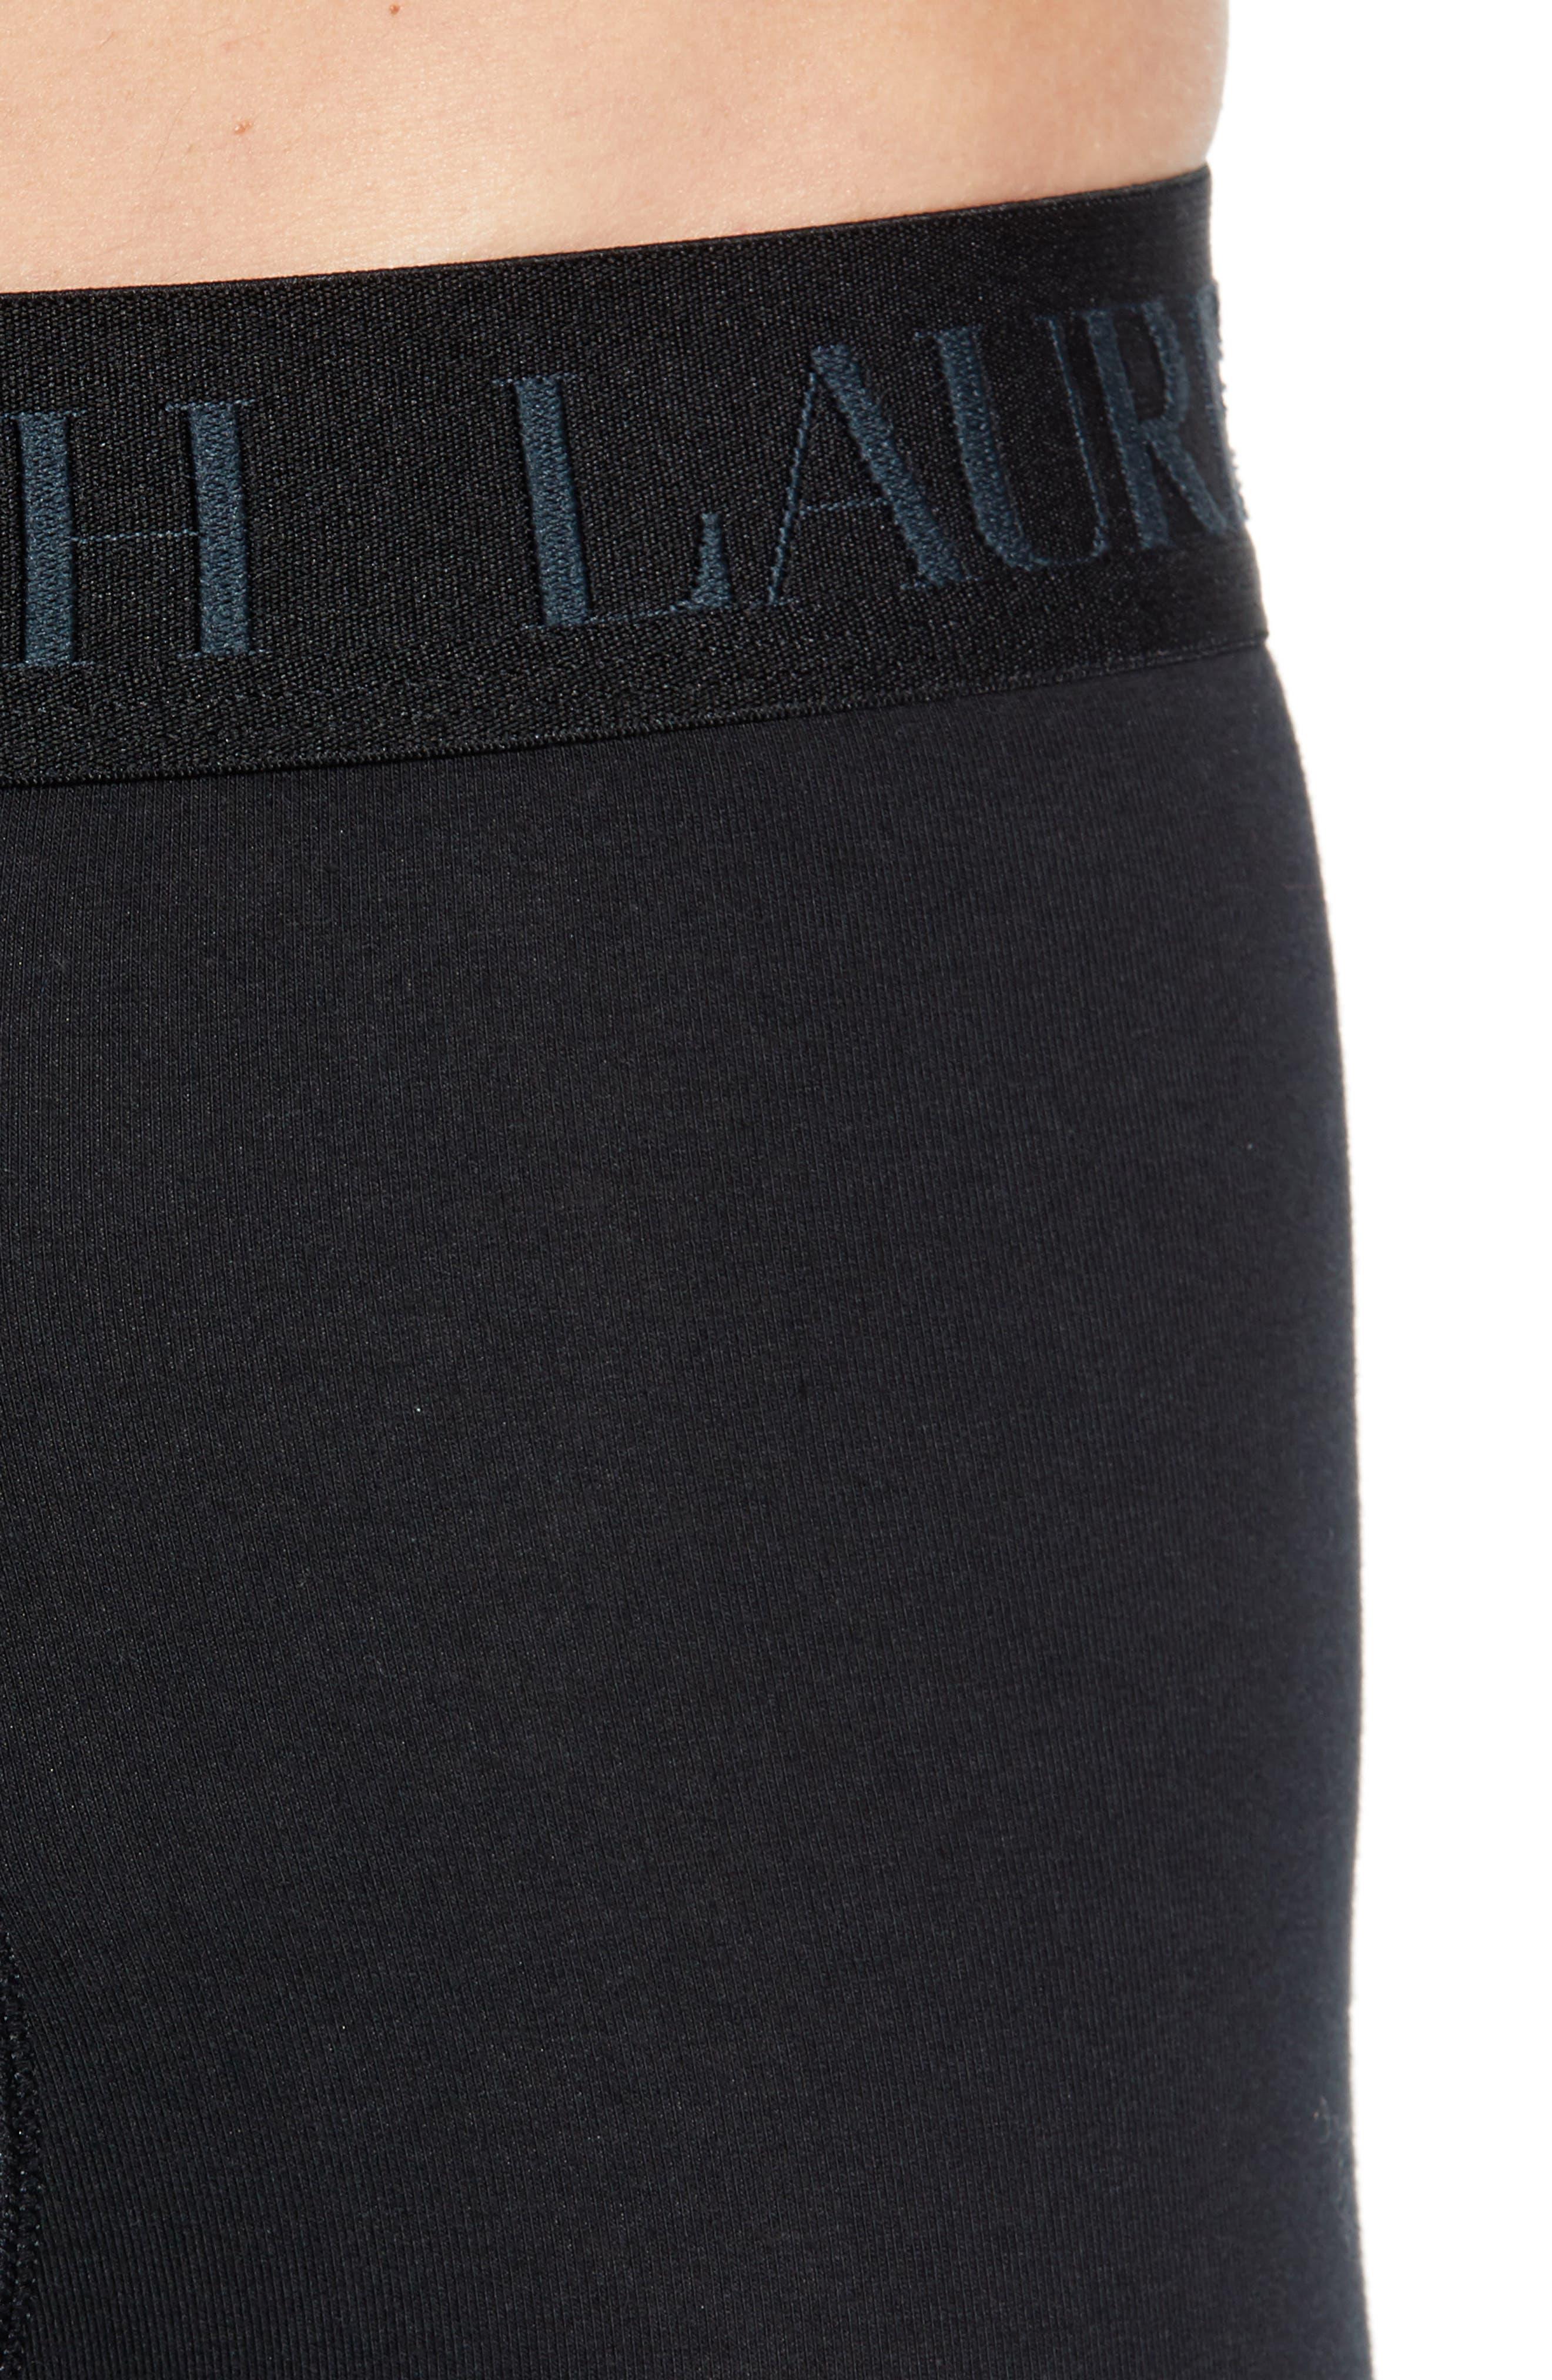 POLO RALPH LAUREN,                             2-Pack Cotton & Modal Boxer Briefs,                             Alternate thumbnail 5, color,                             POLO BLACK